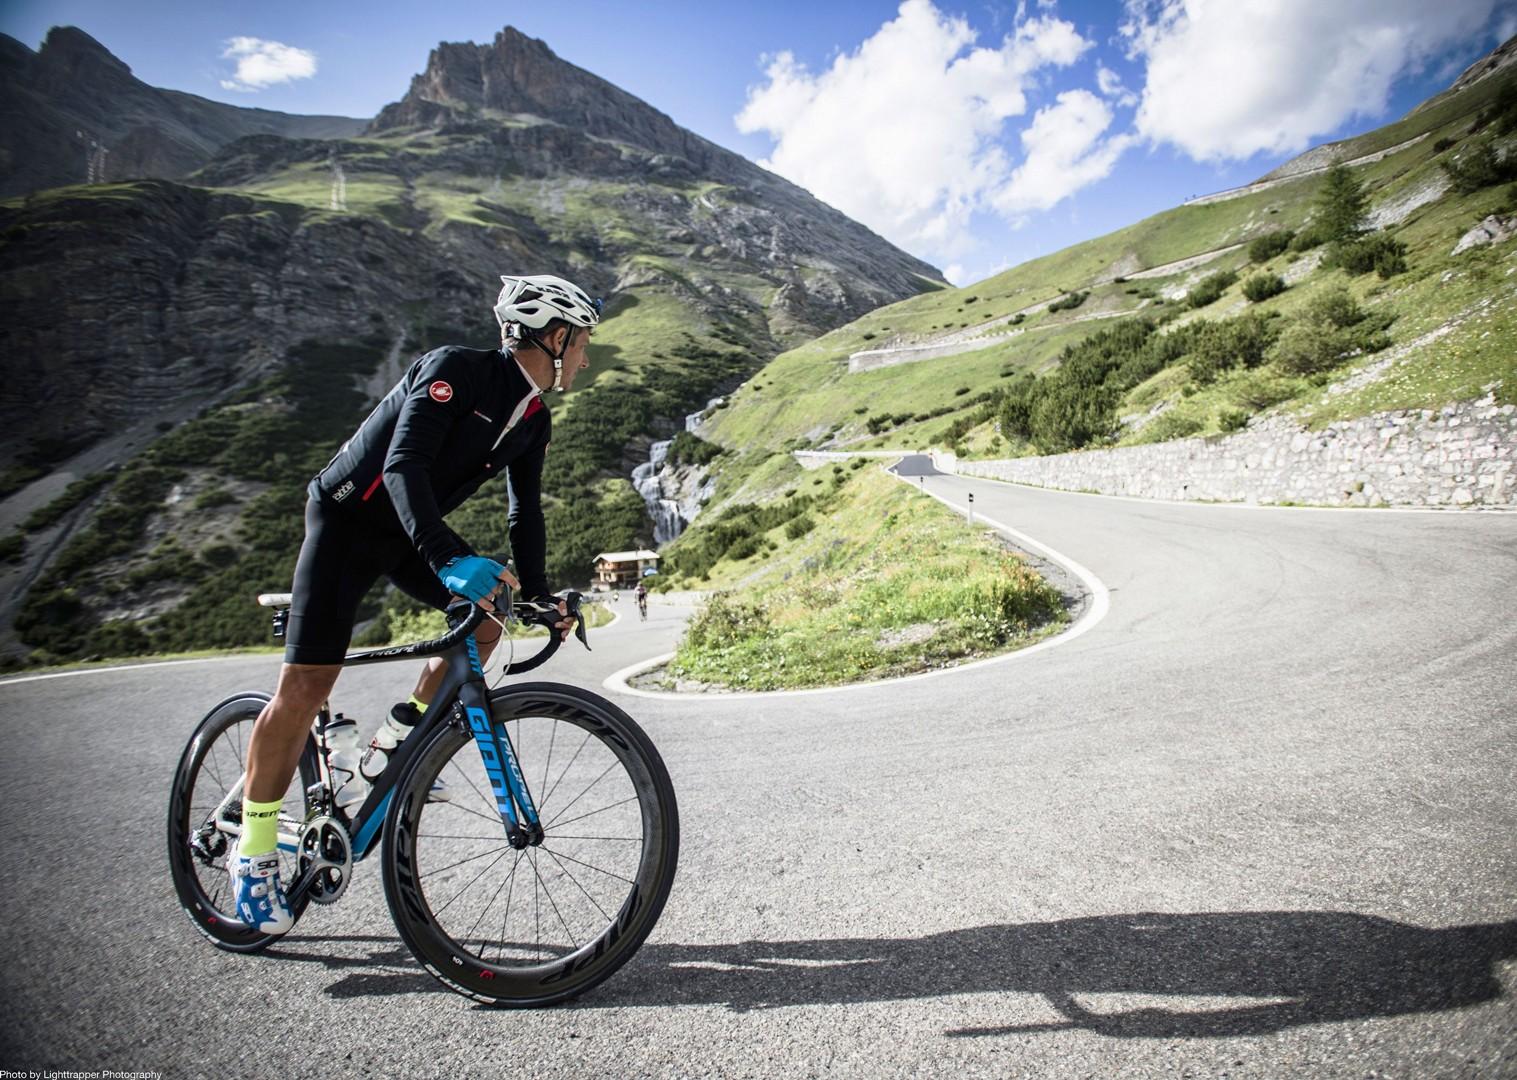 italian-alps-guided-road-cycling-holiday.jpg - Italy - Italian Alps - Guided Road Cycling Holiday - Italia Road Cycling